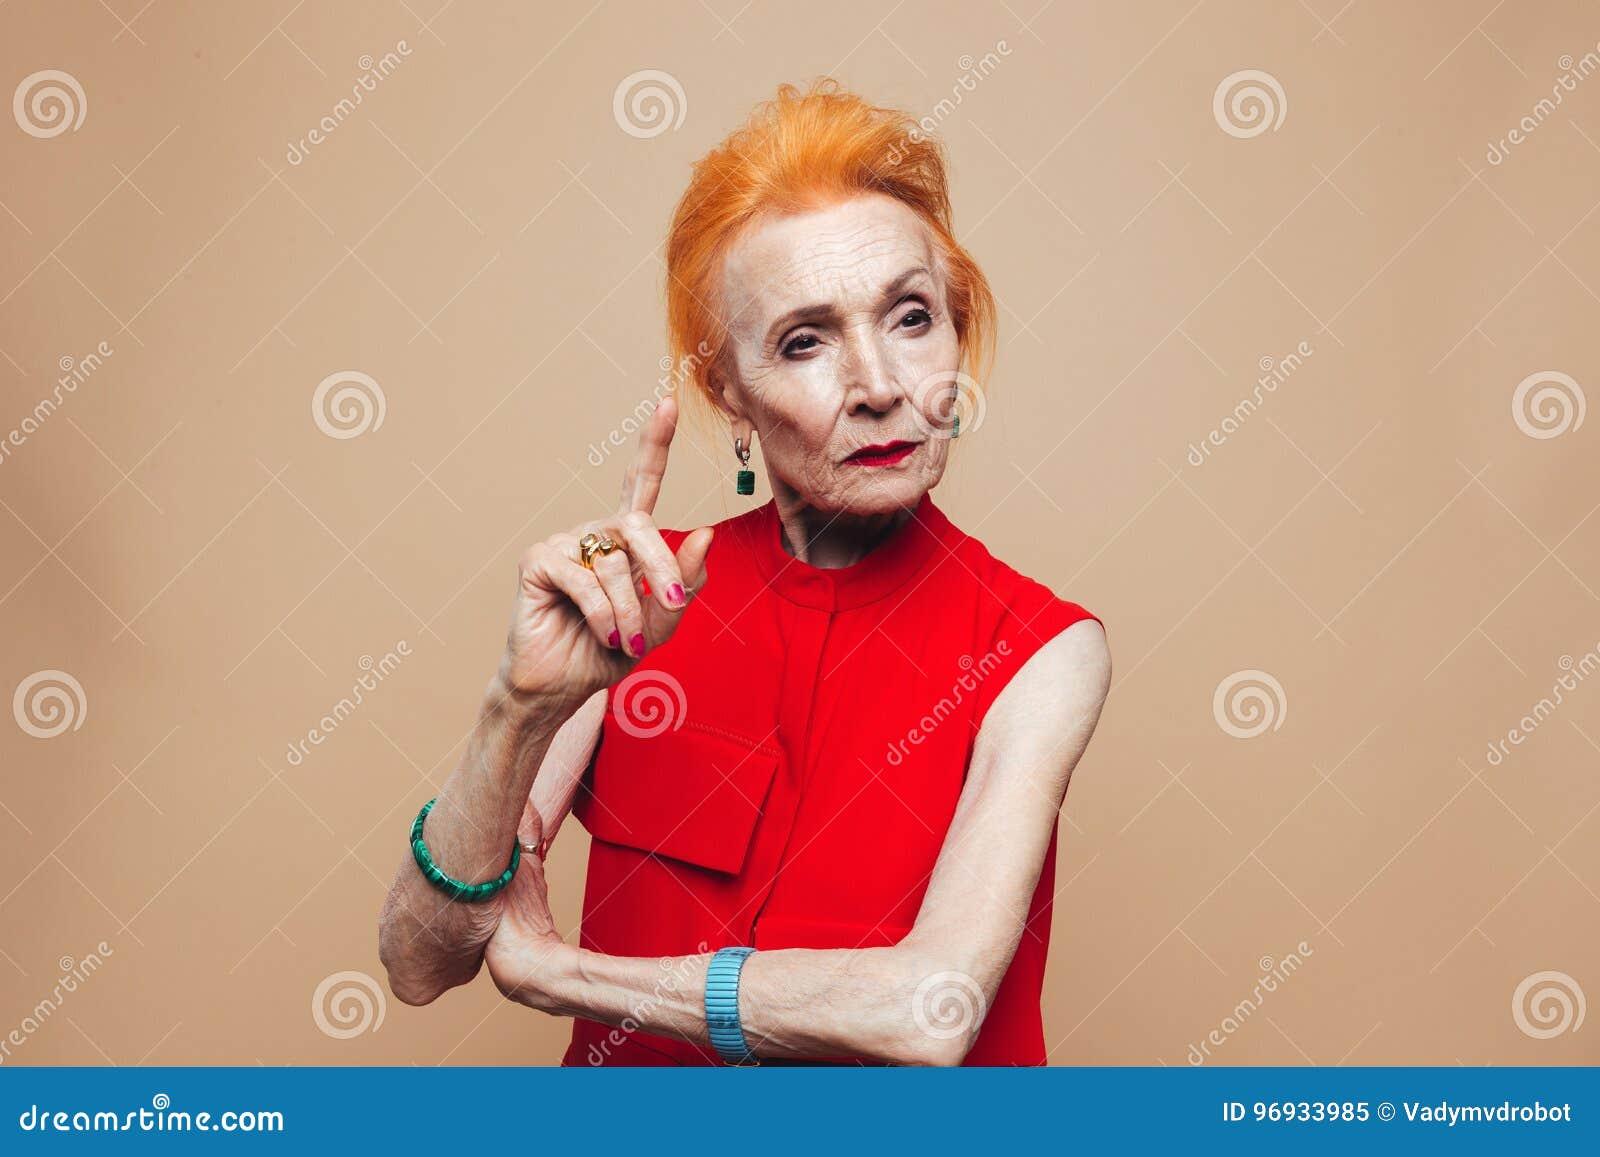 thinking mature redhead fashion woman stock image - image of face